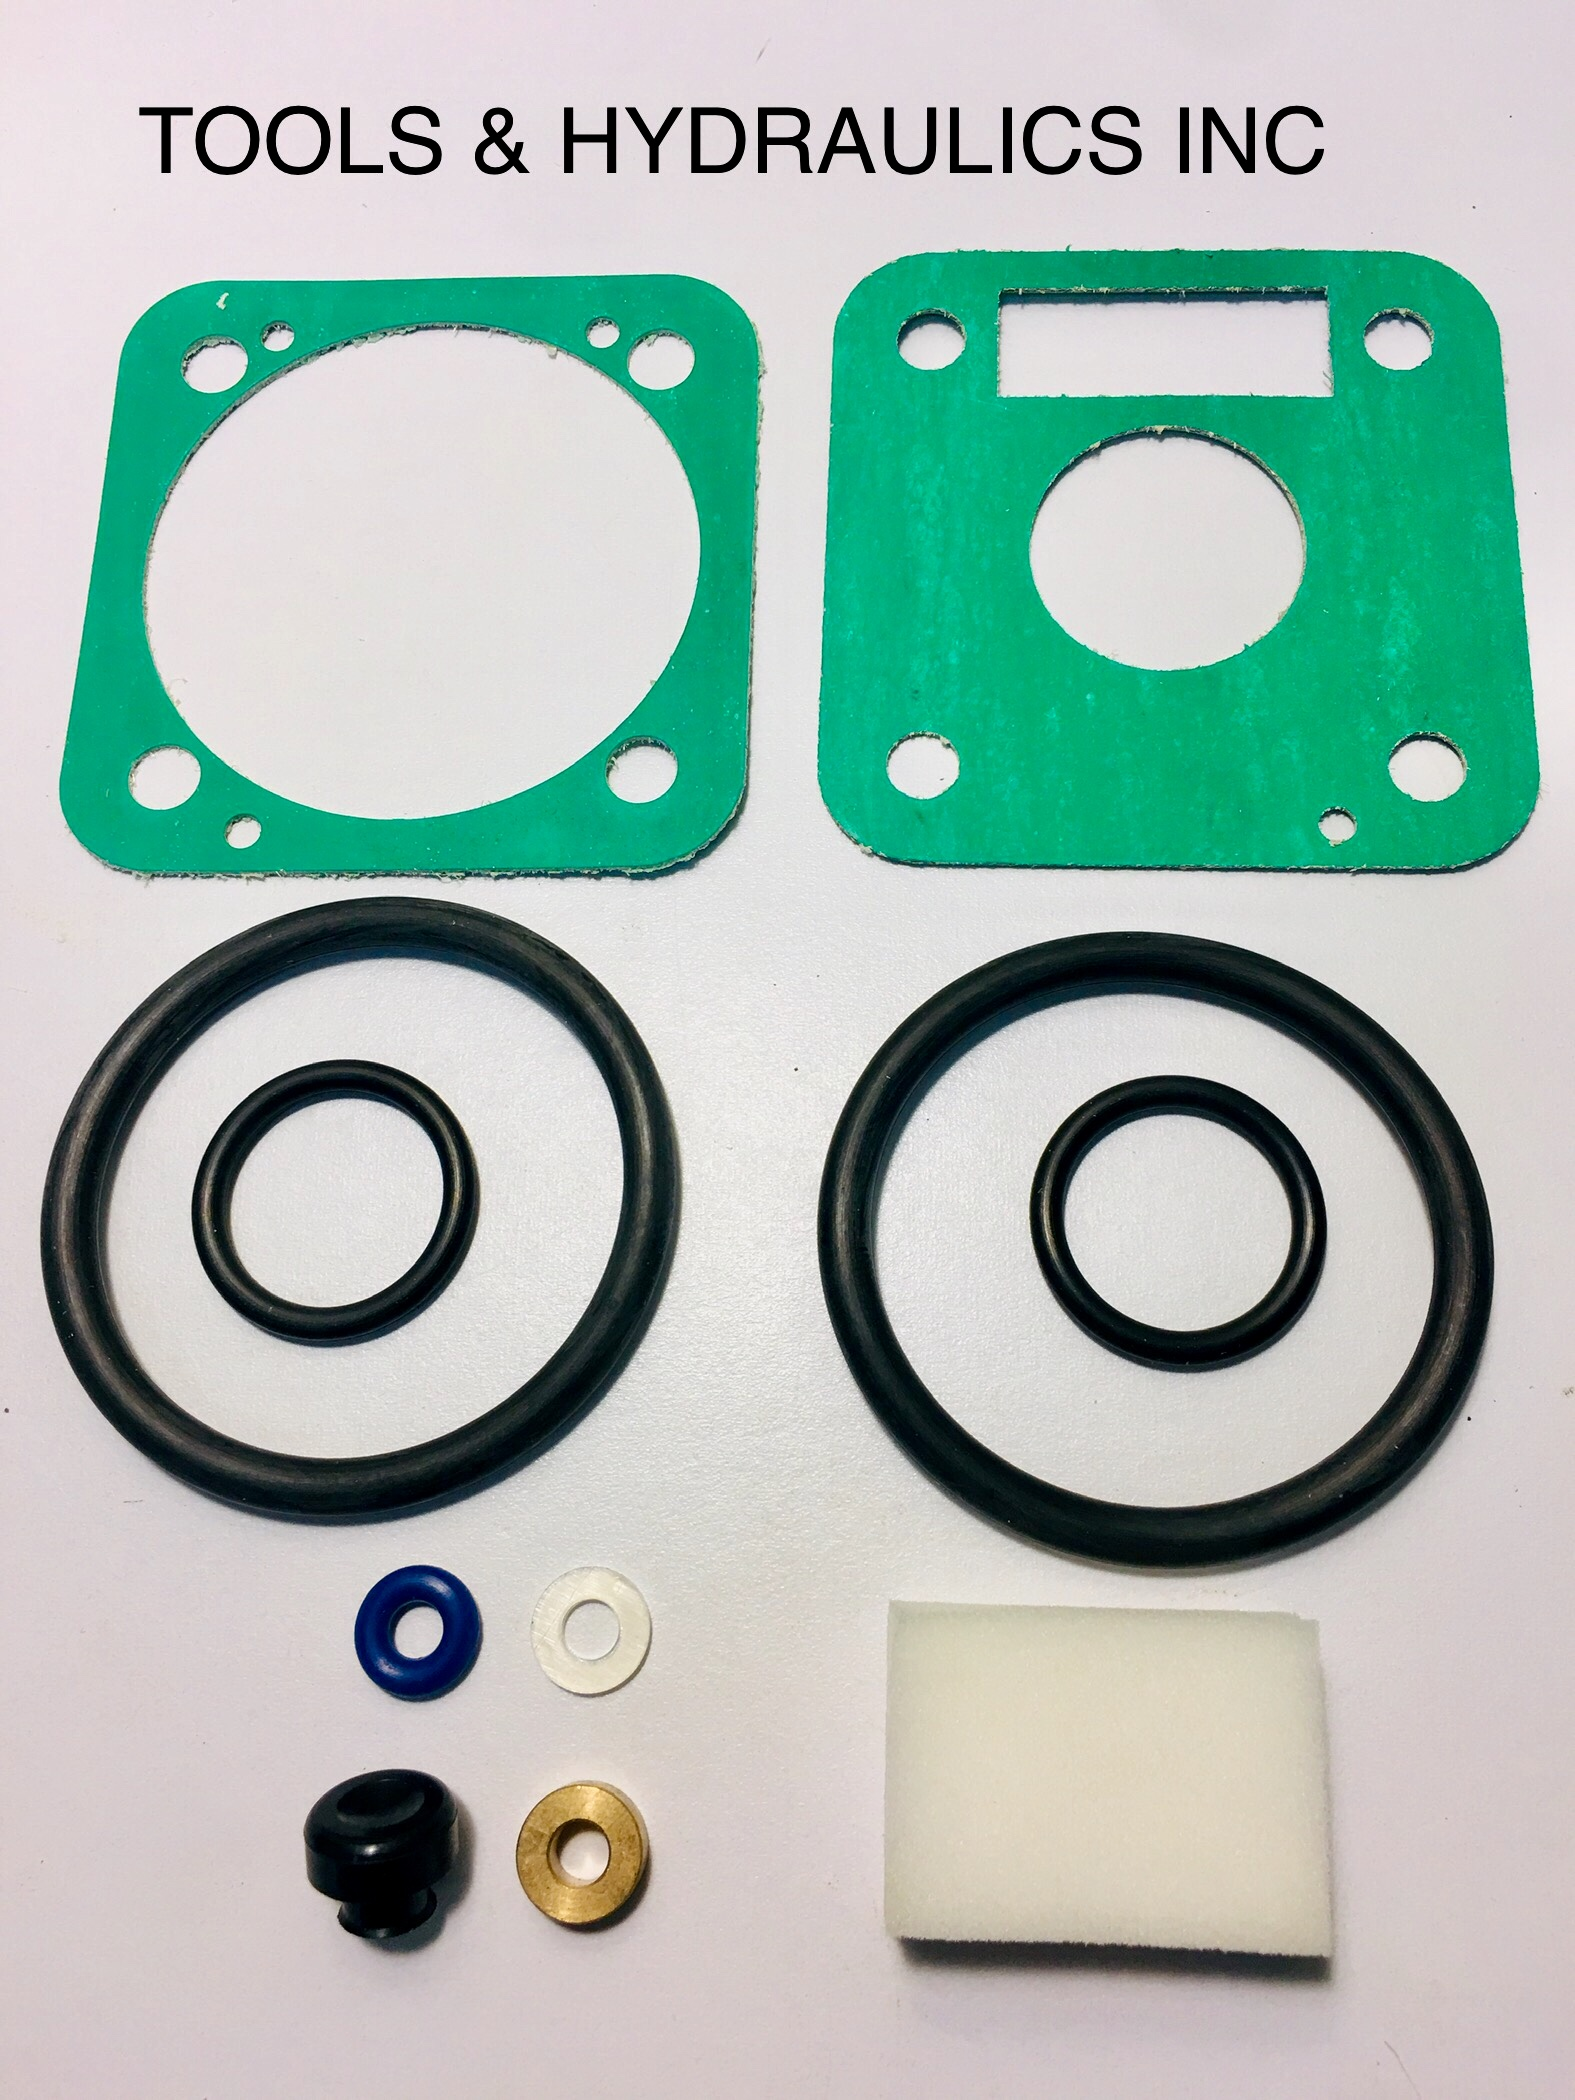 Popular MacTool & MATCO Jack Repair Kits